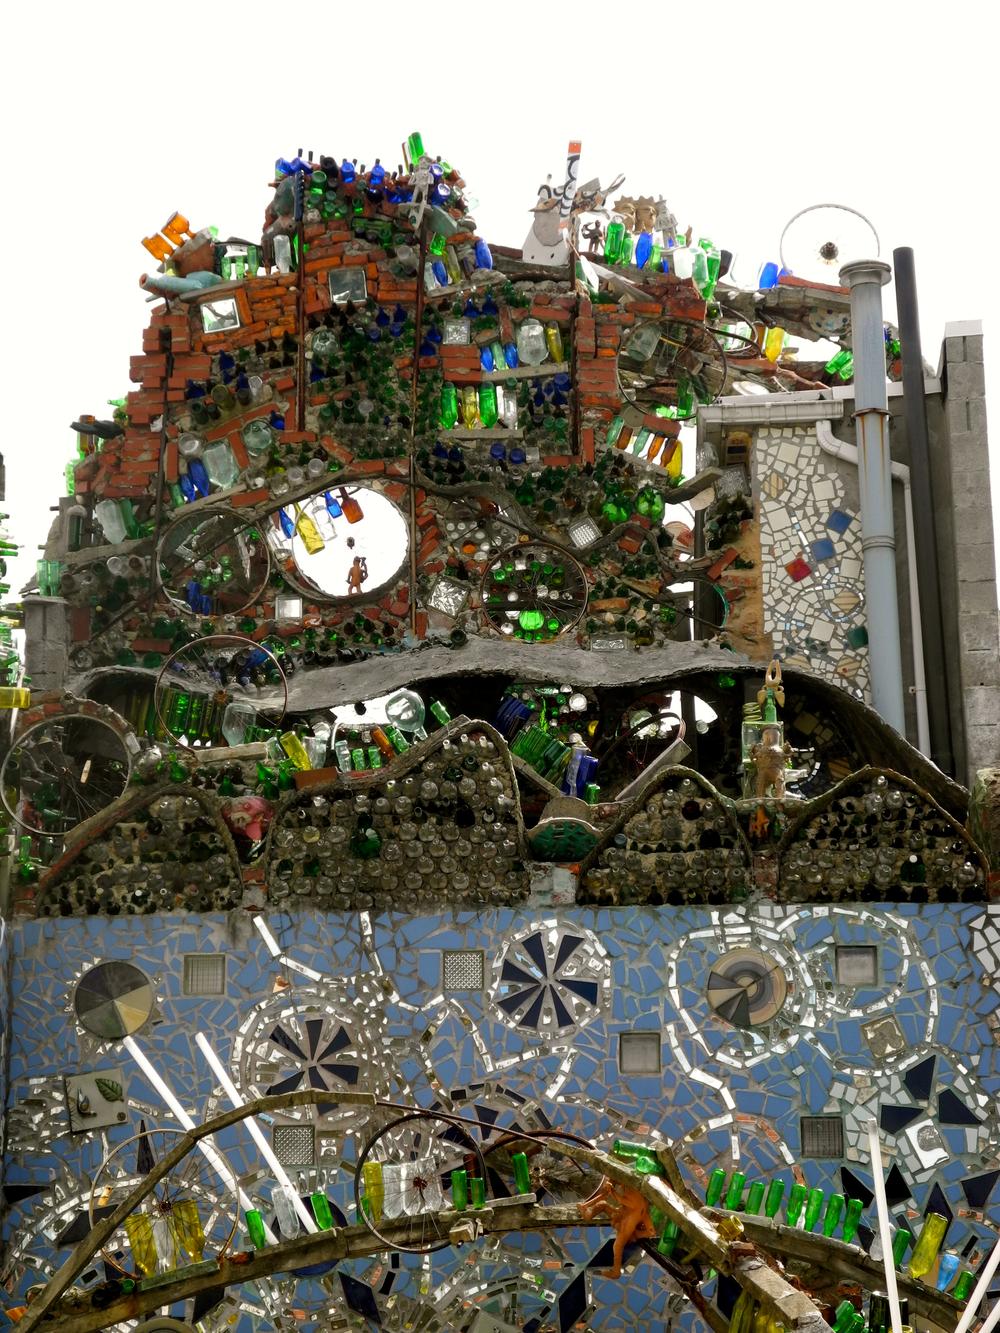 Isaiah Zagar Magic Garden Mosaic Mural Sculpture.